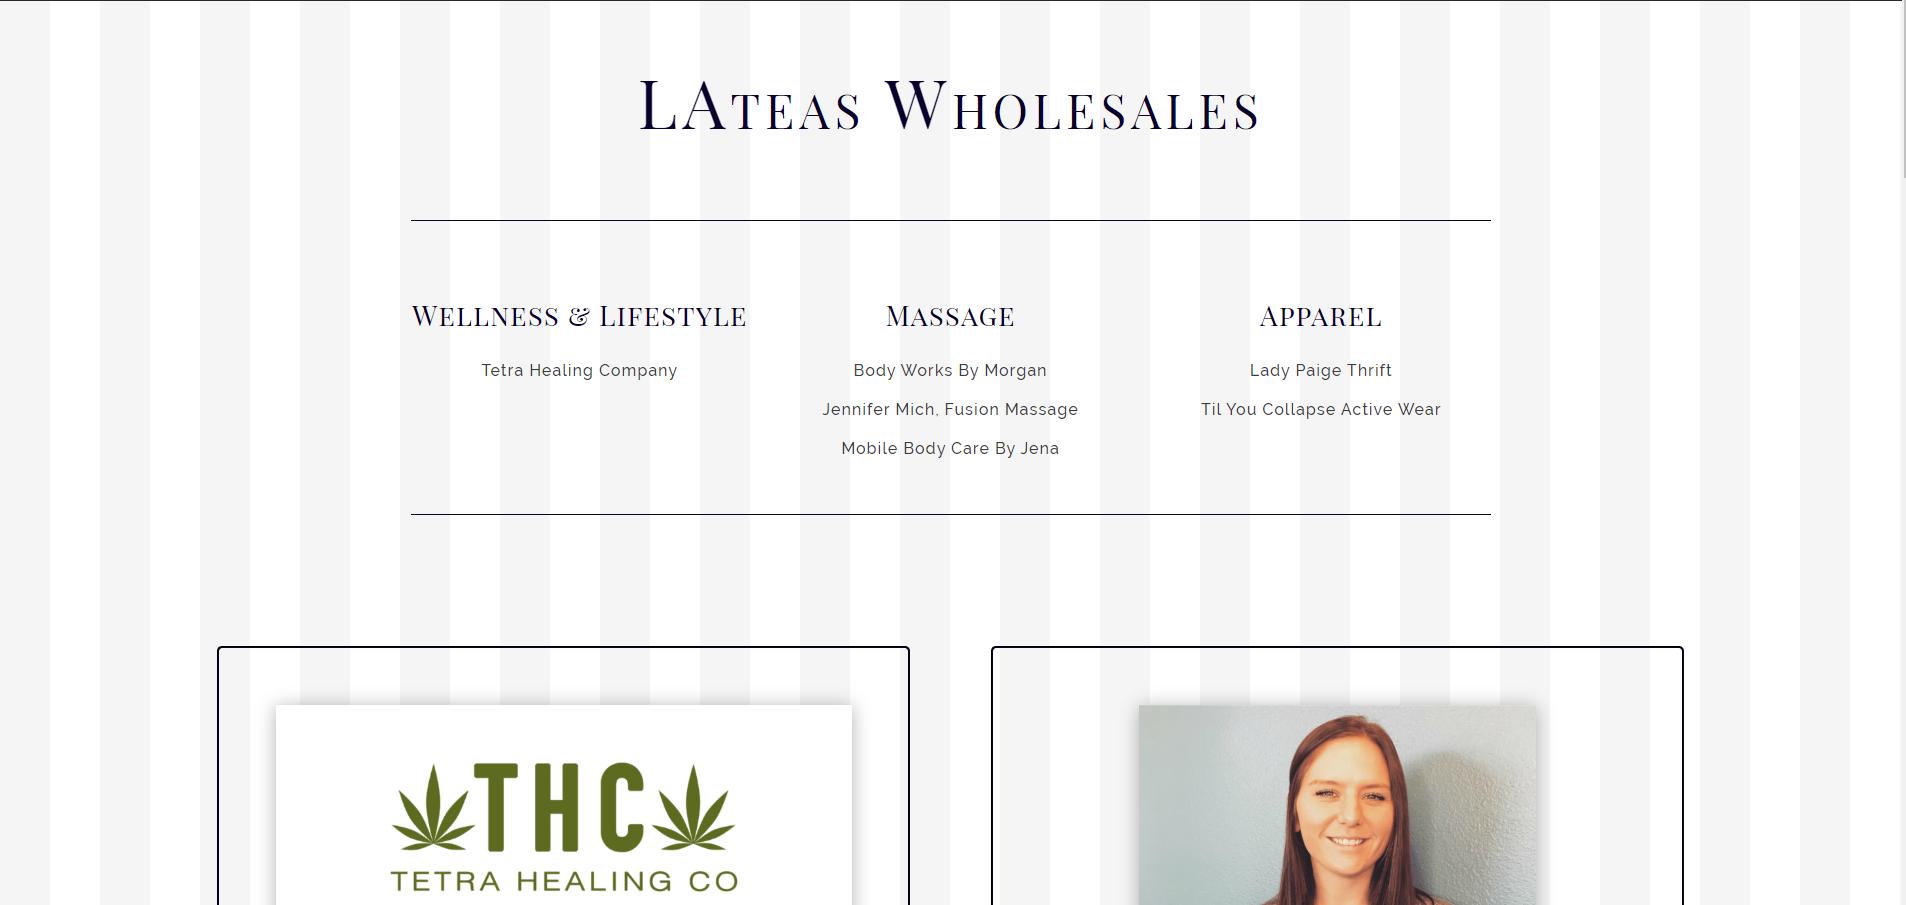 Lateas Wholesales